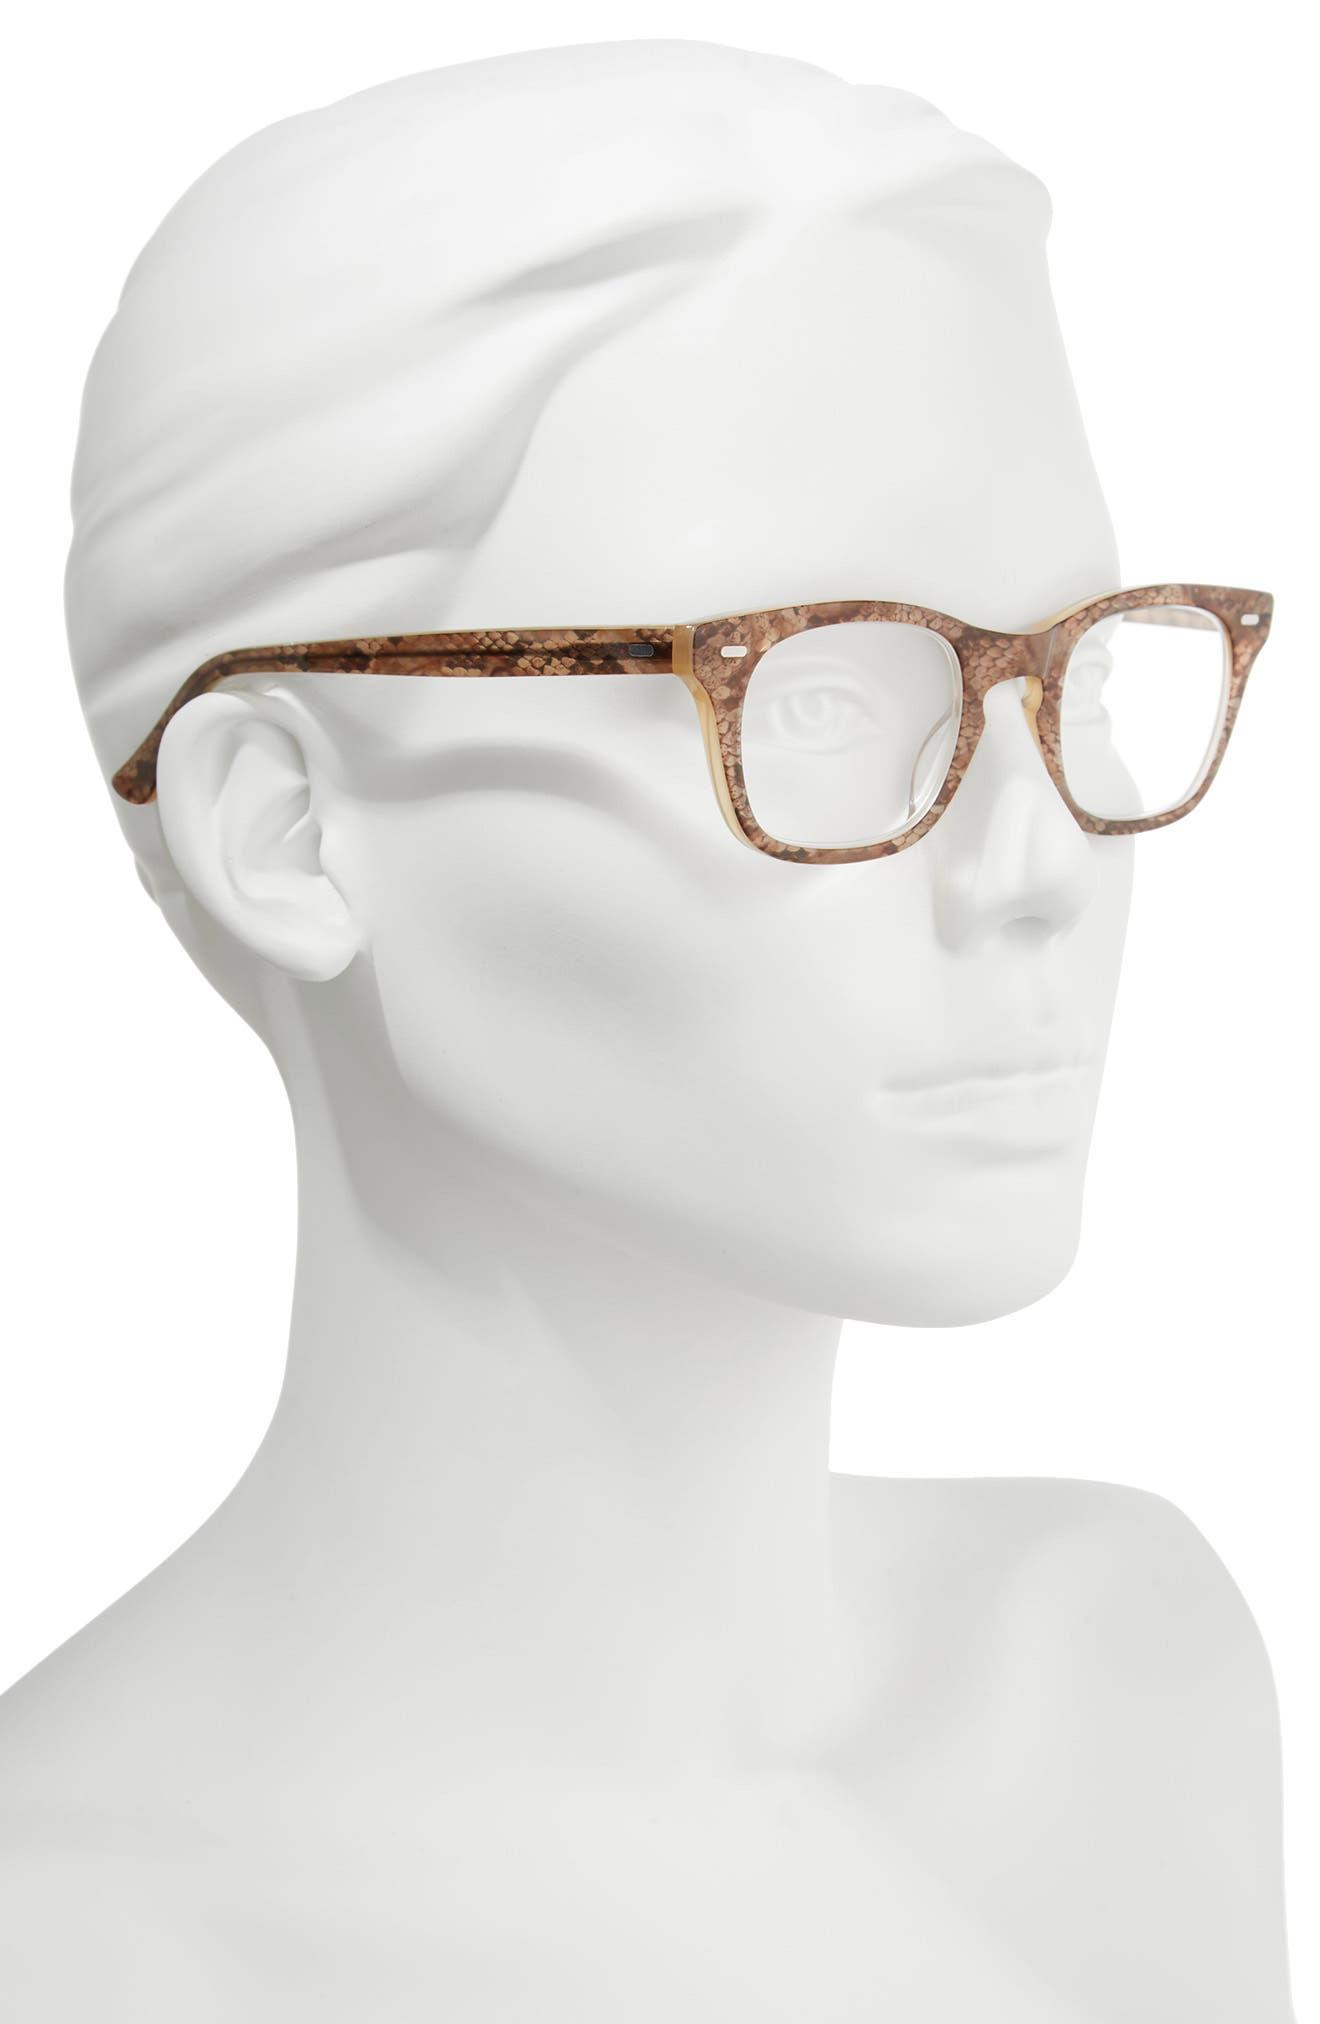 'Toni' 48mm Reading Glasses,                             Alternate thumbnail 2, color,                             BROWN SNAKE